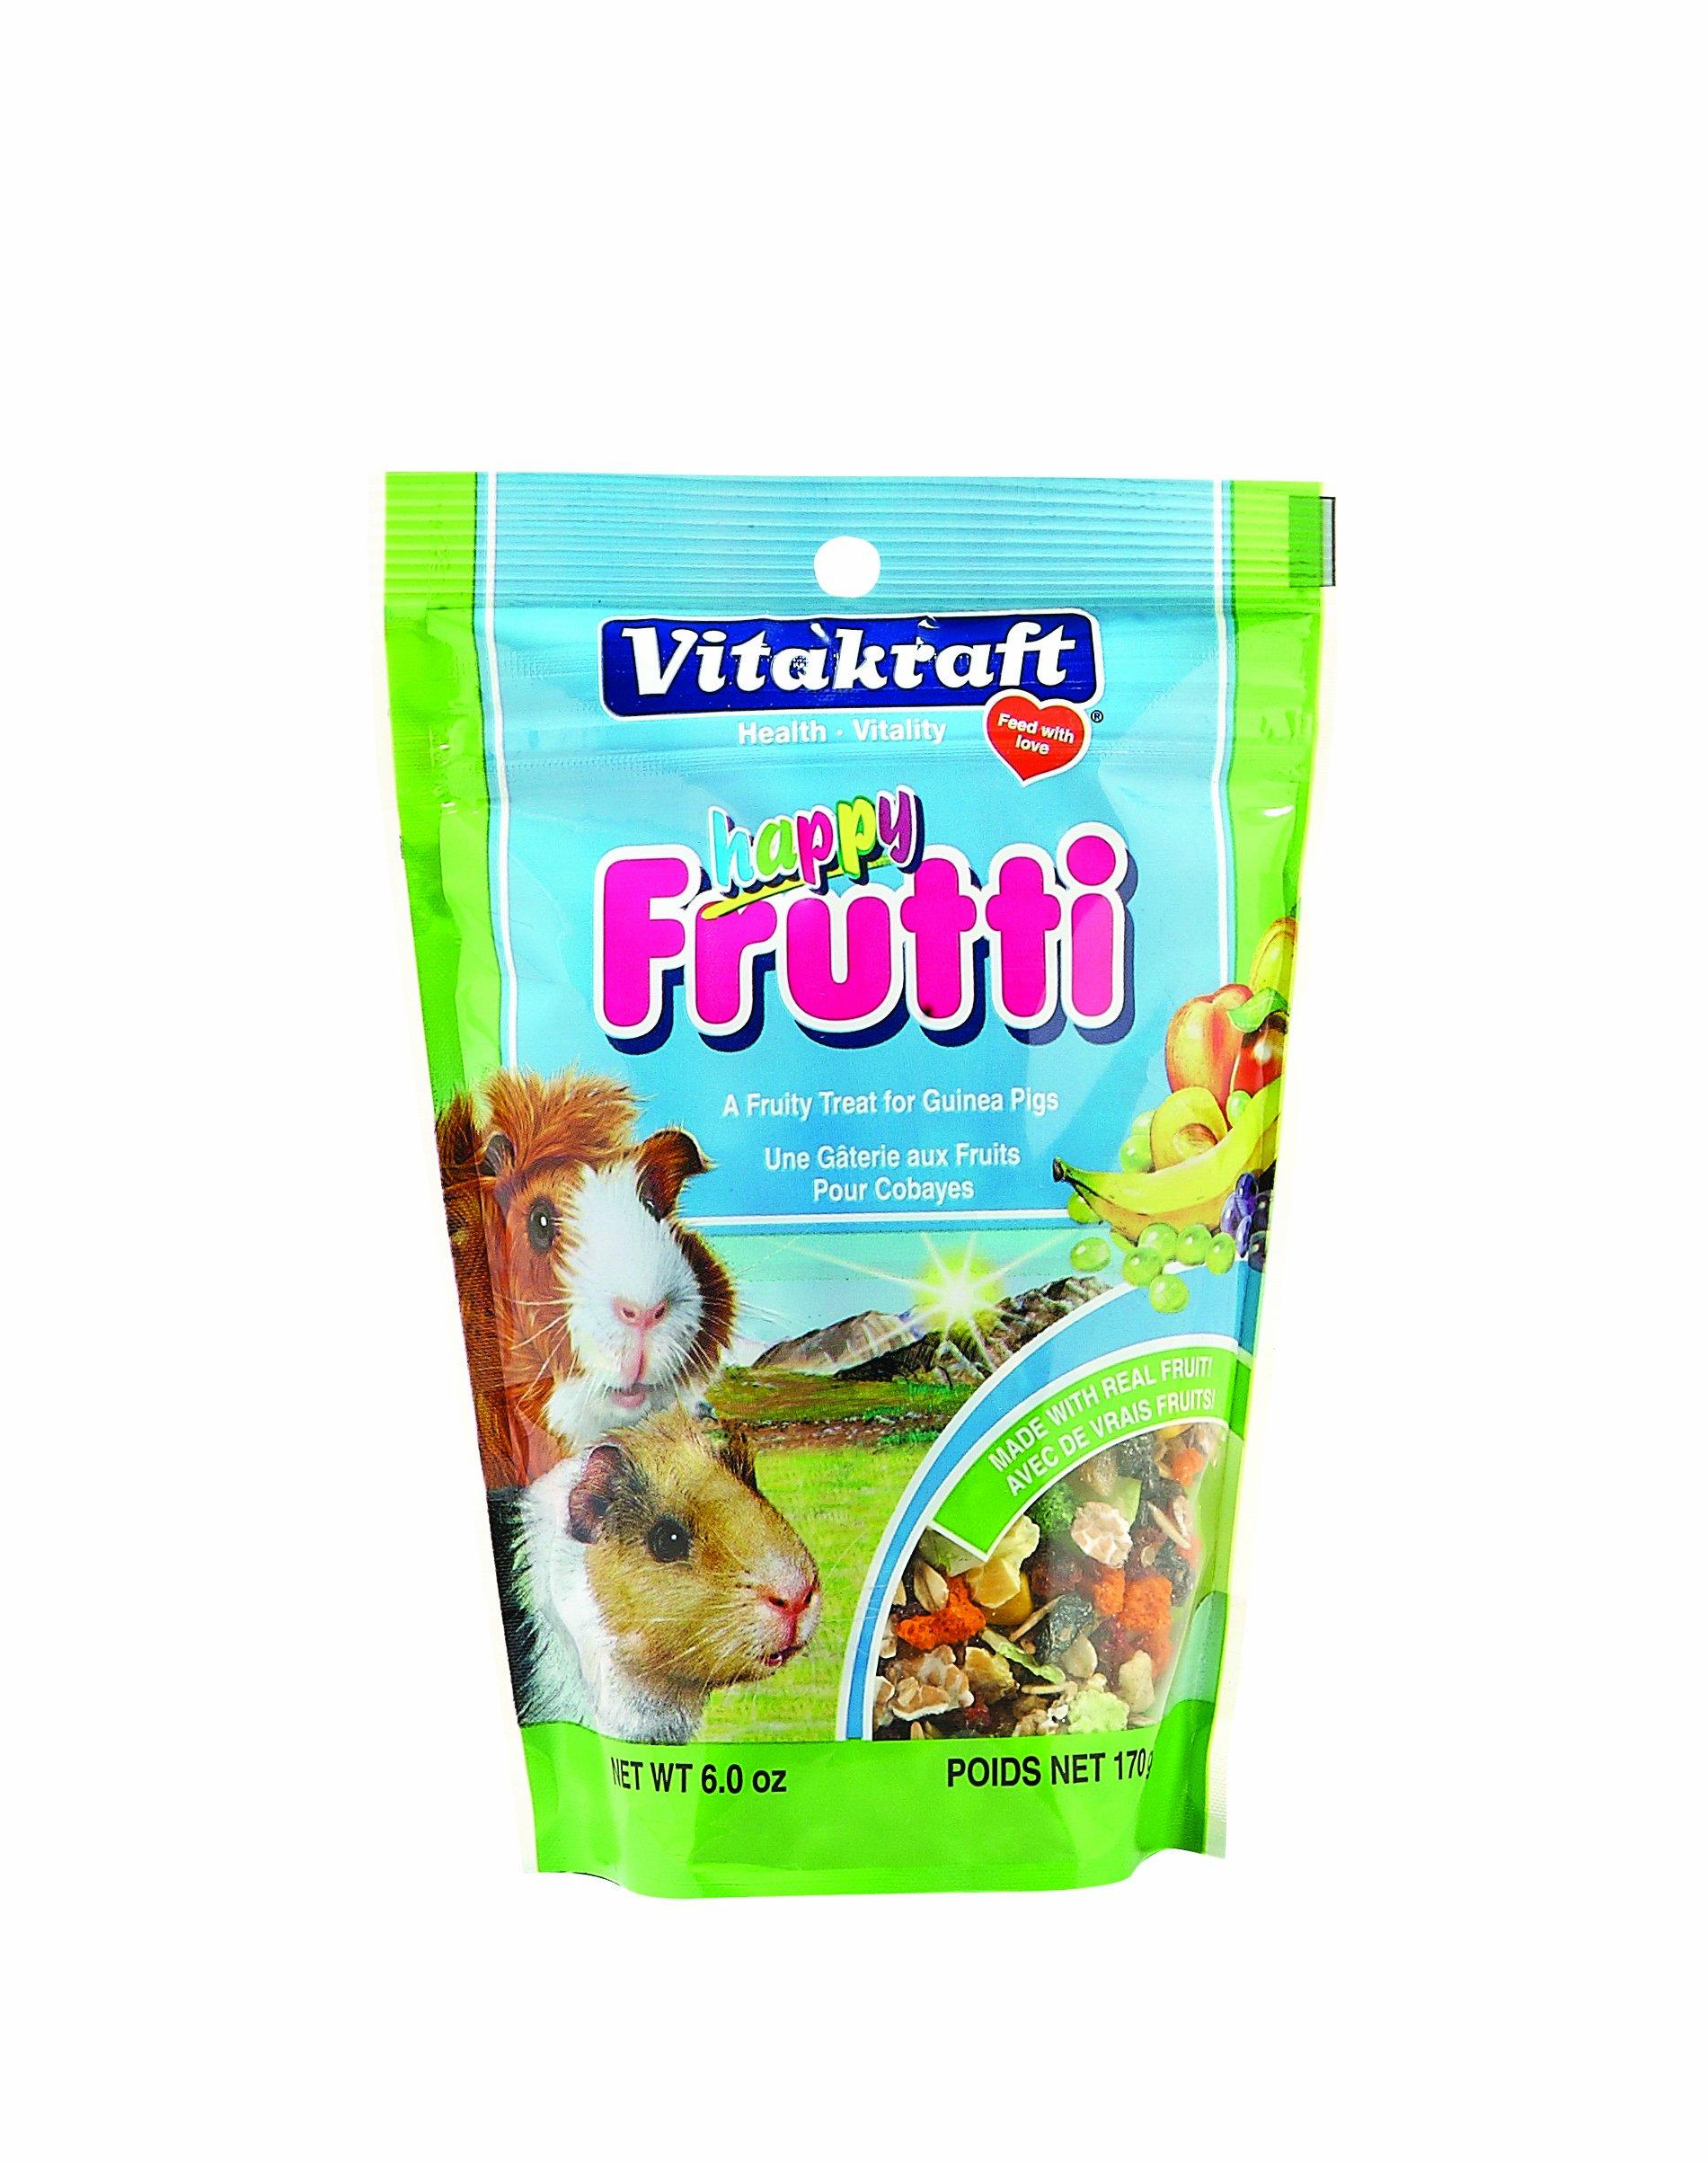 Vitakraft Guinea Pig Happy Frutti Treat, 6 Ounce Pouch